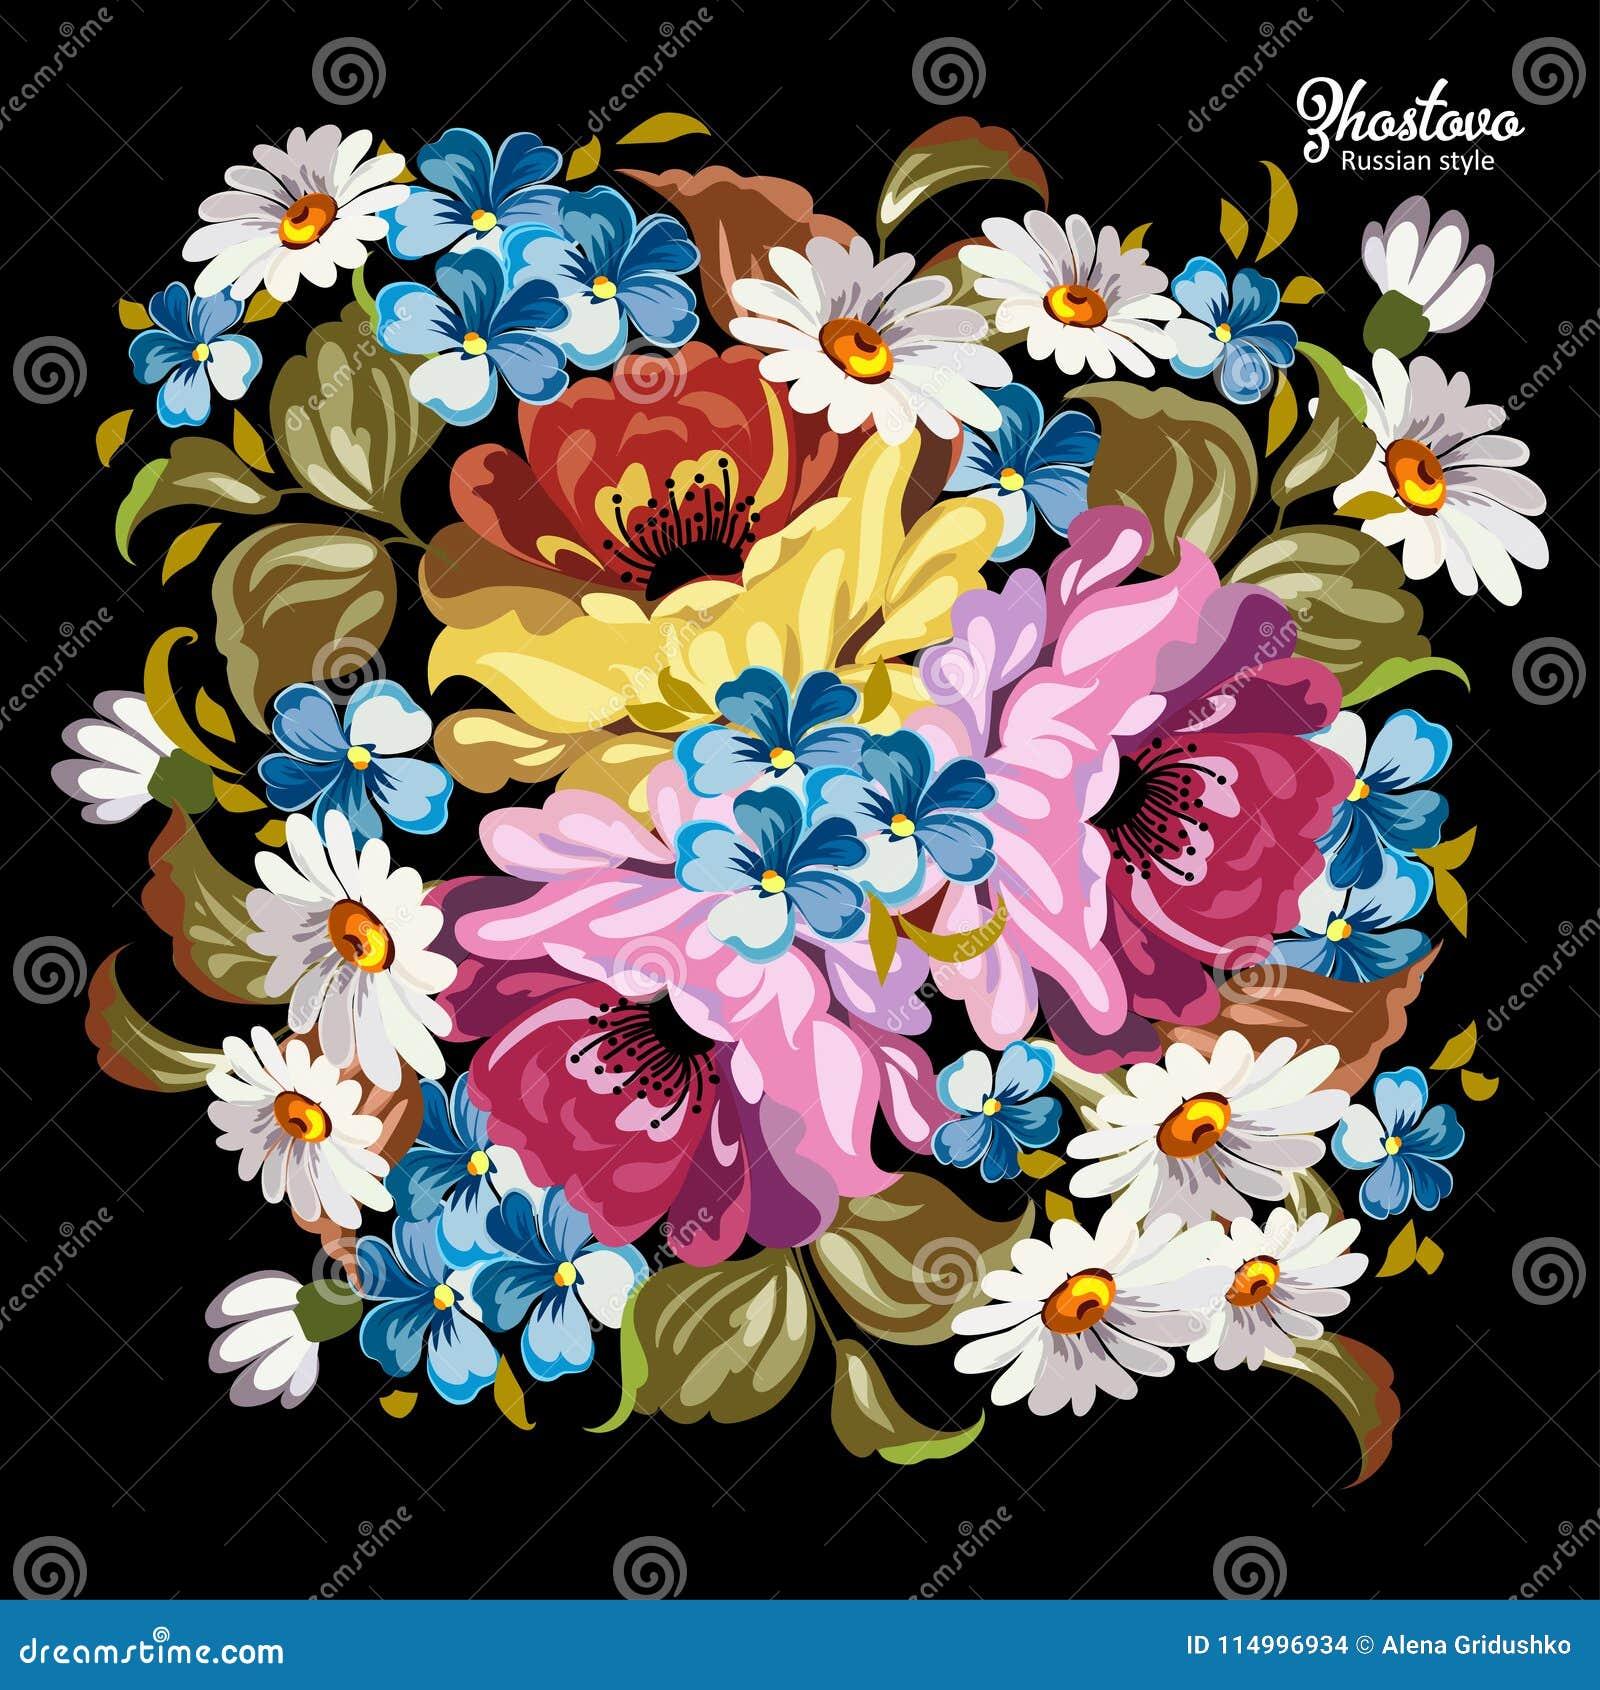 Rosjanina Zhostovo obraz, rosjanin stylowa dekoracja i projekta element,